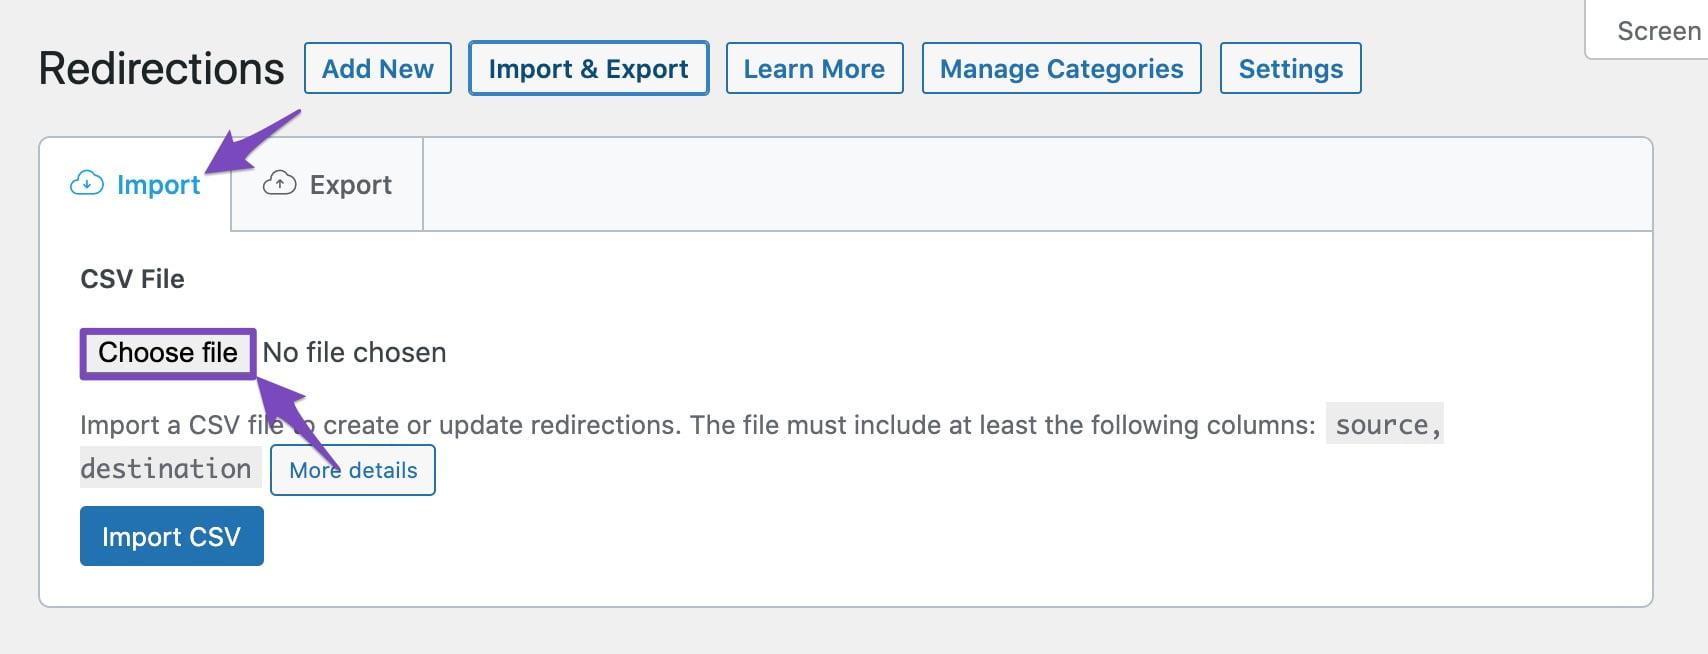 Choose CSV file to upload